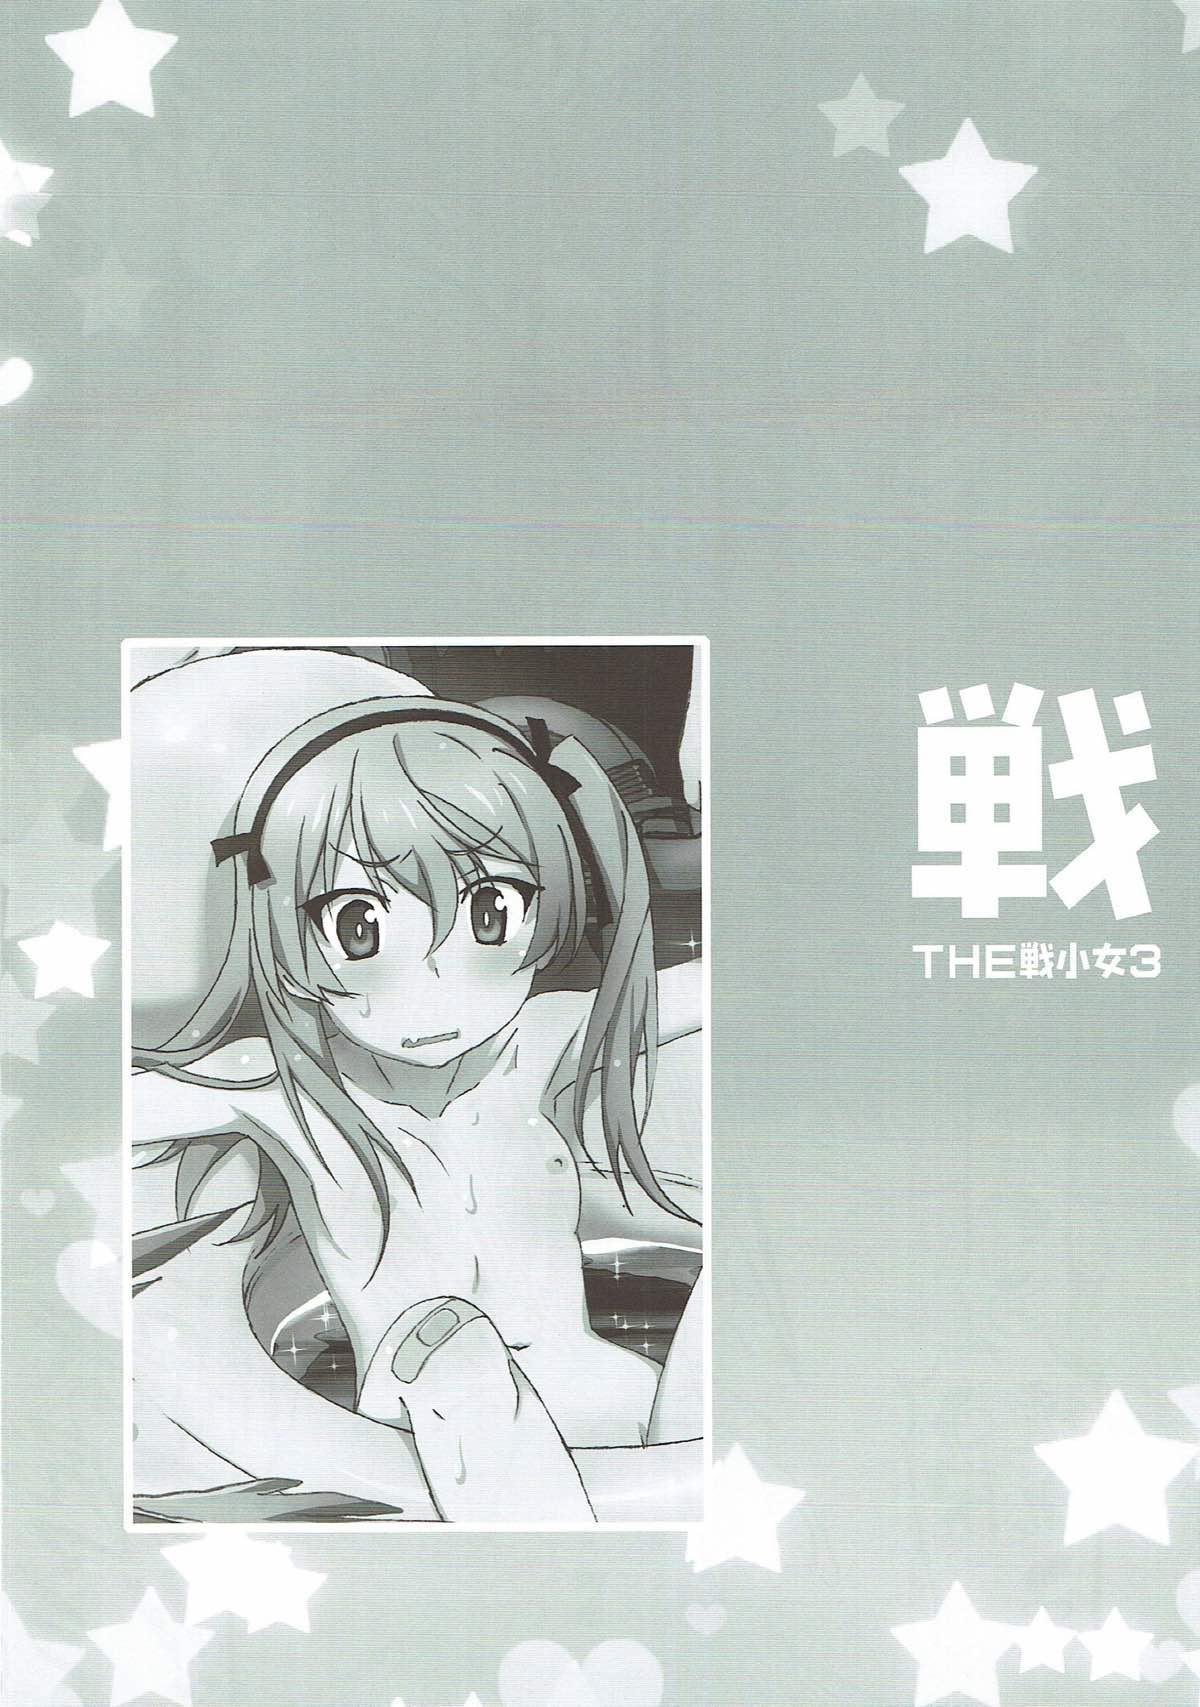 THE Senshoujo 3 26